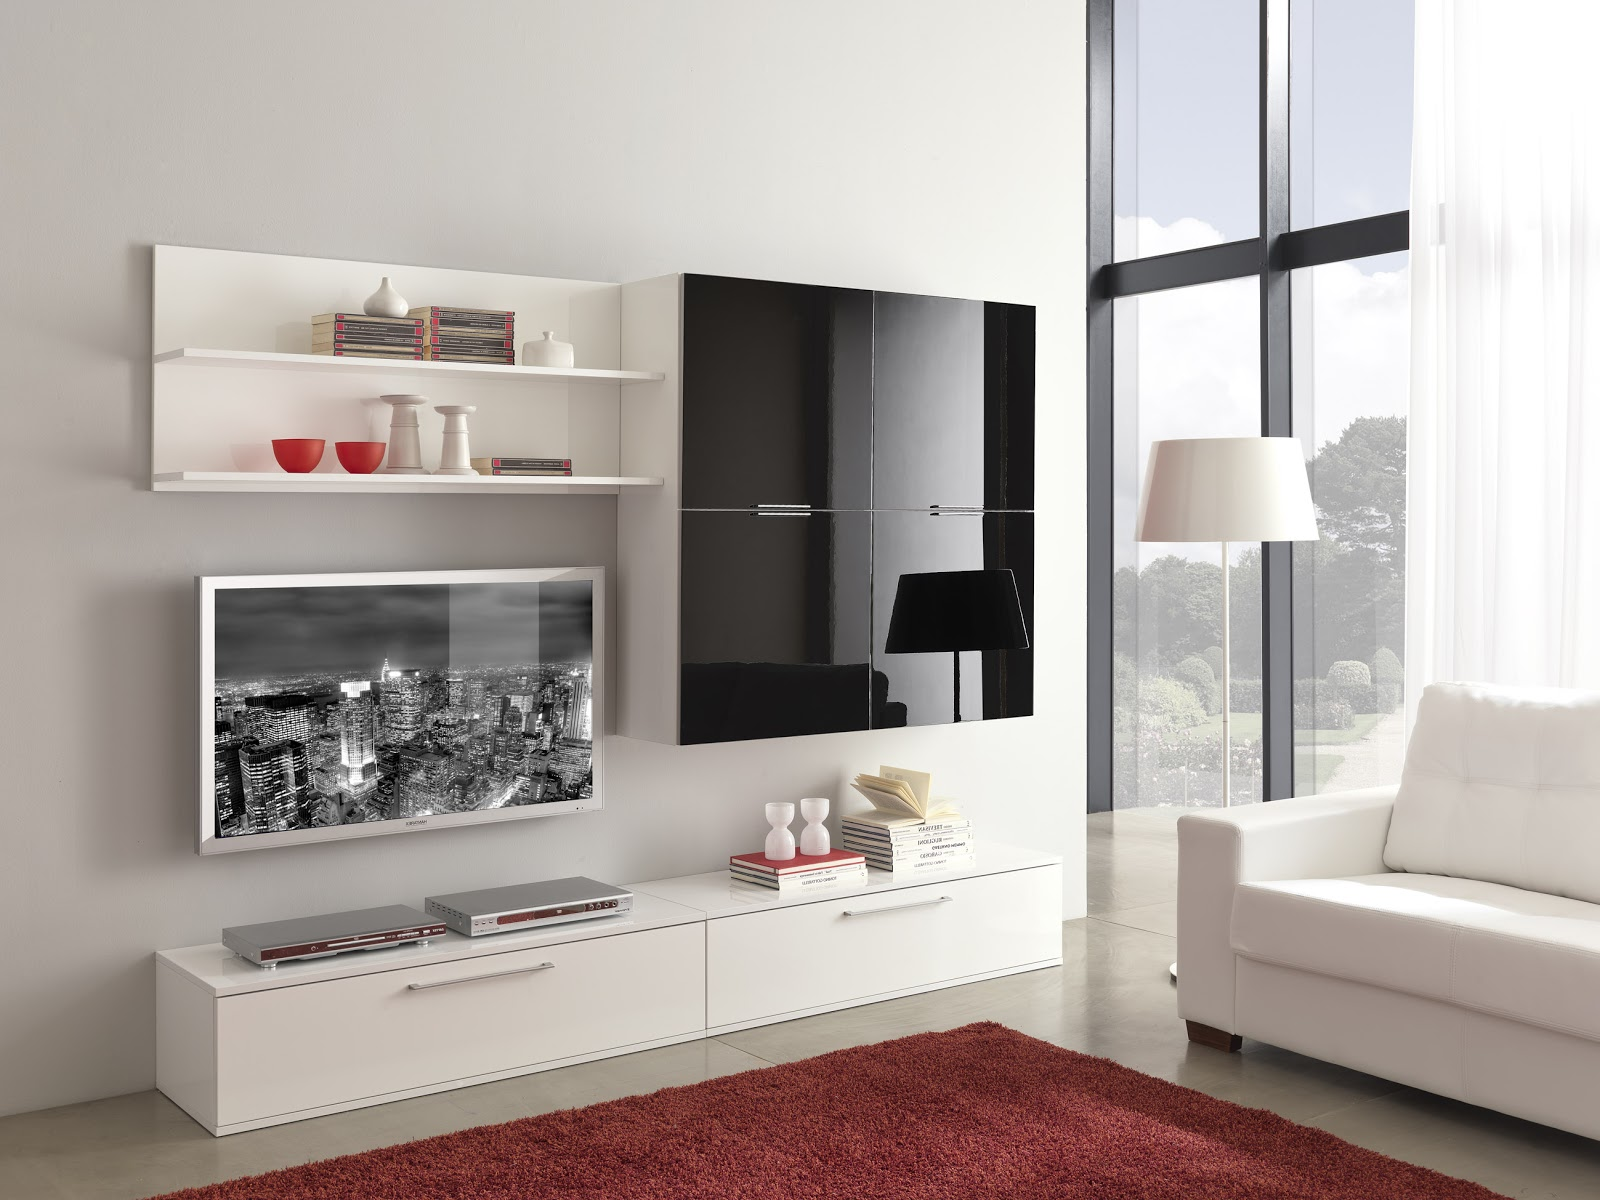 Idee arredamento casa moderno - Idee arredo casa ...